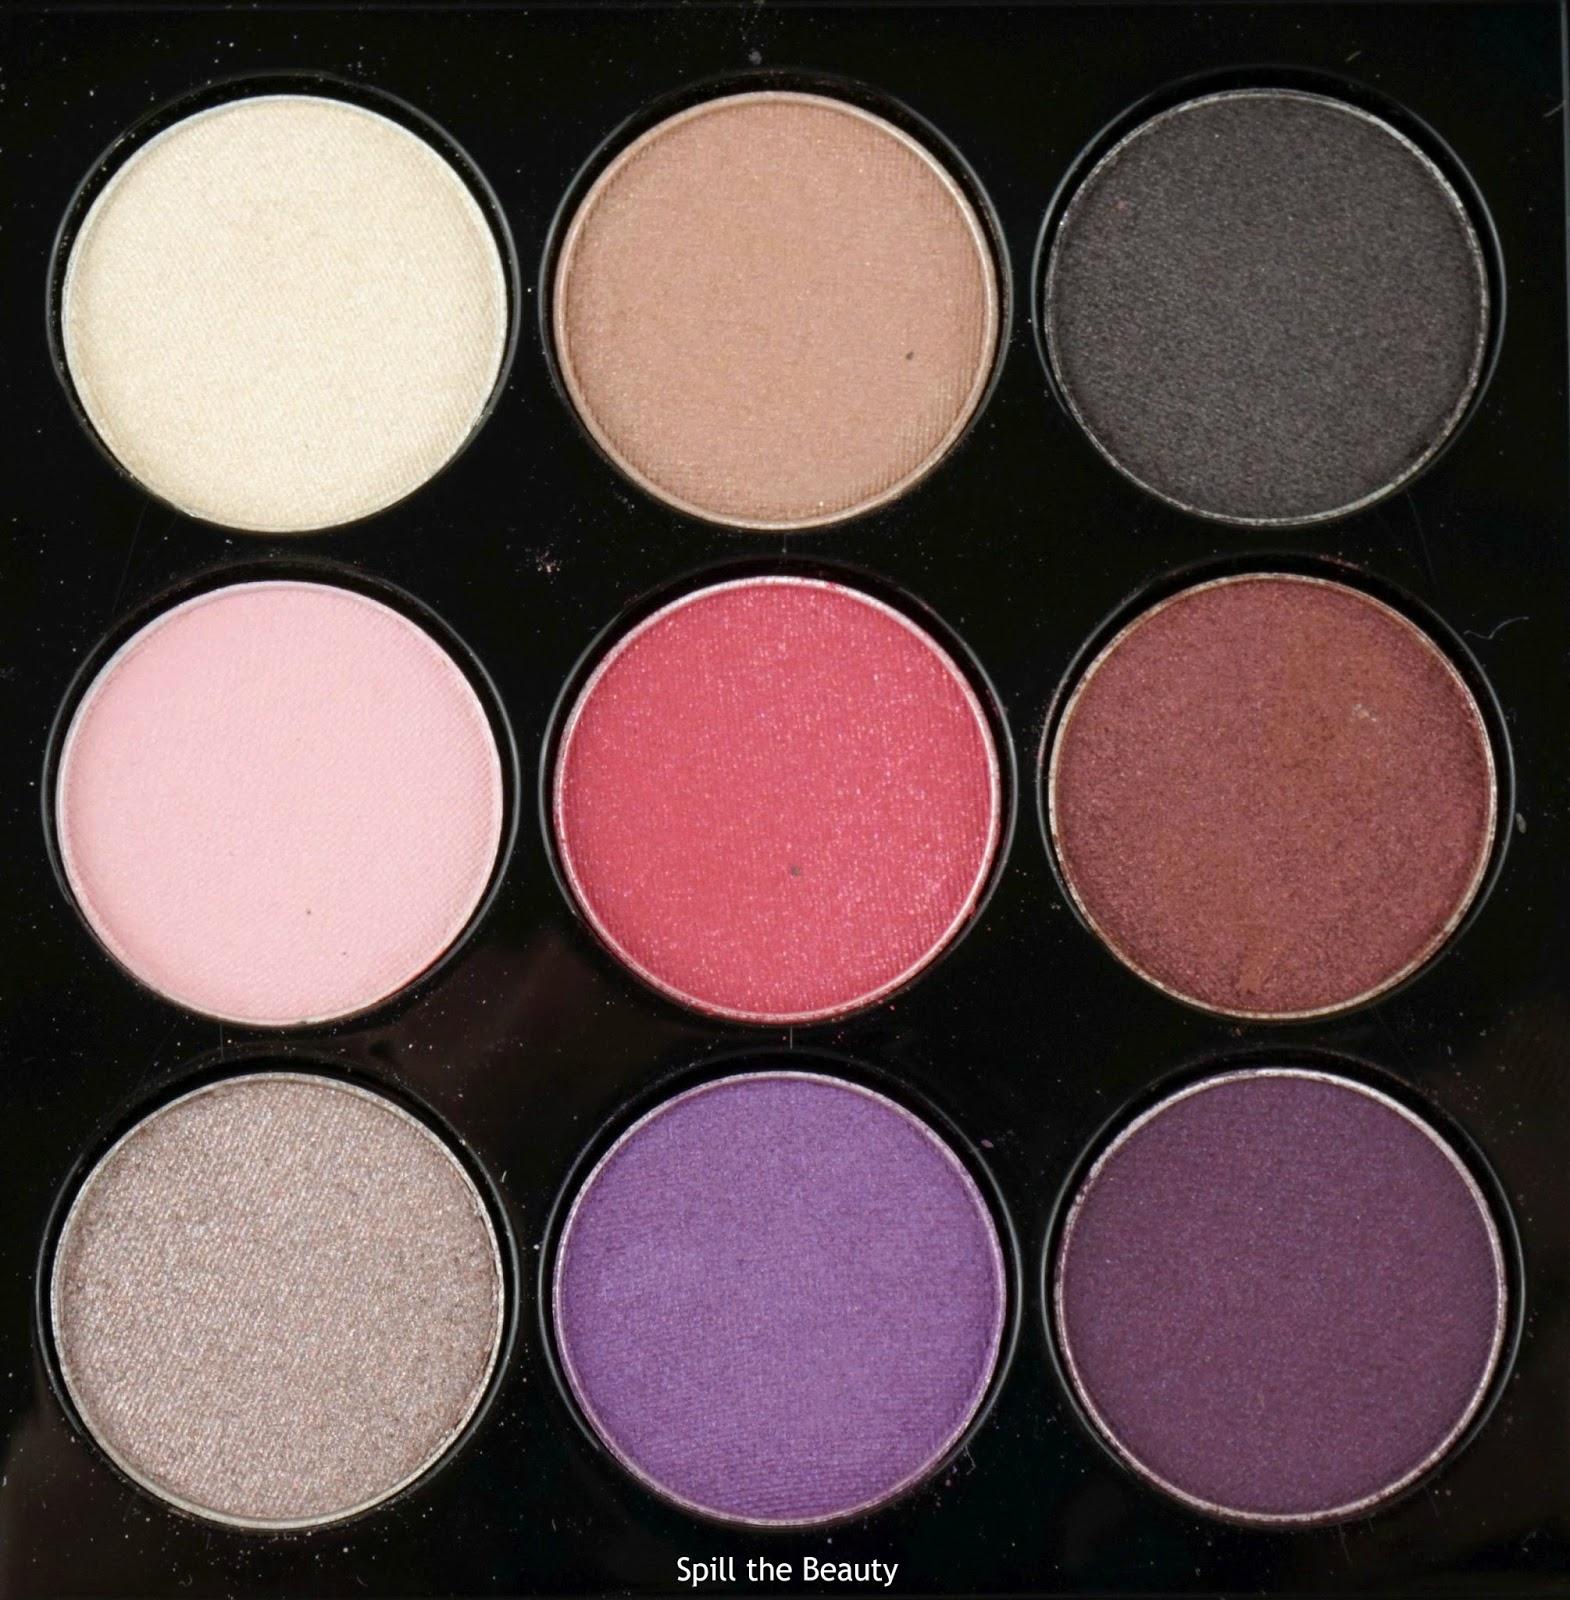 Mac Fashion Pack Collection runway worthy eyeshadow palette